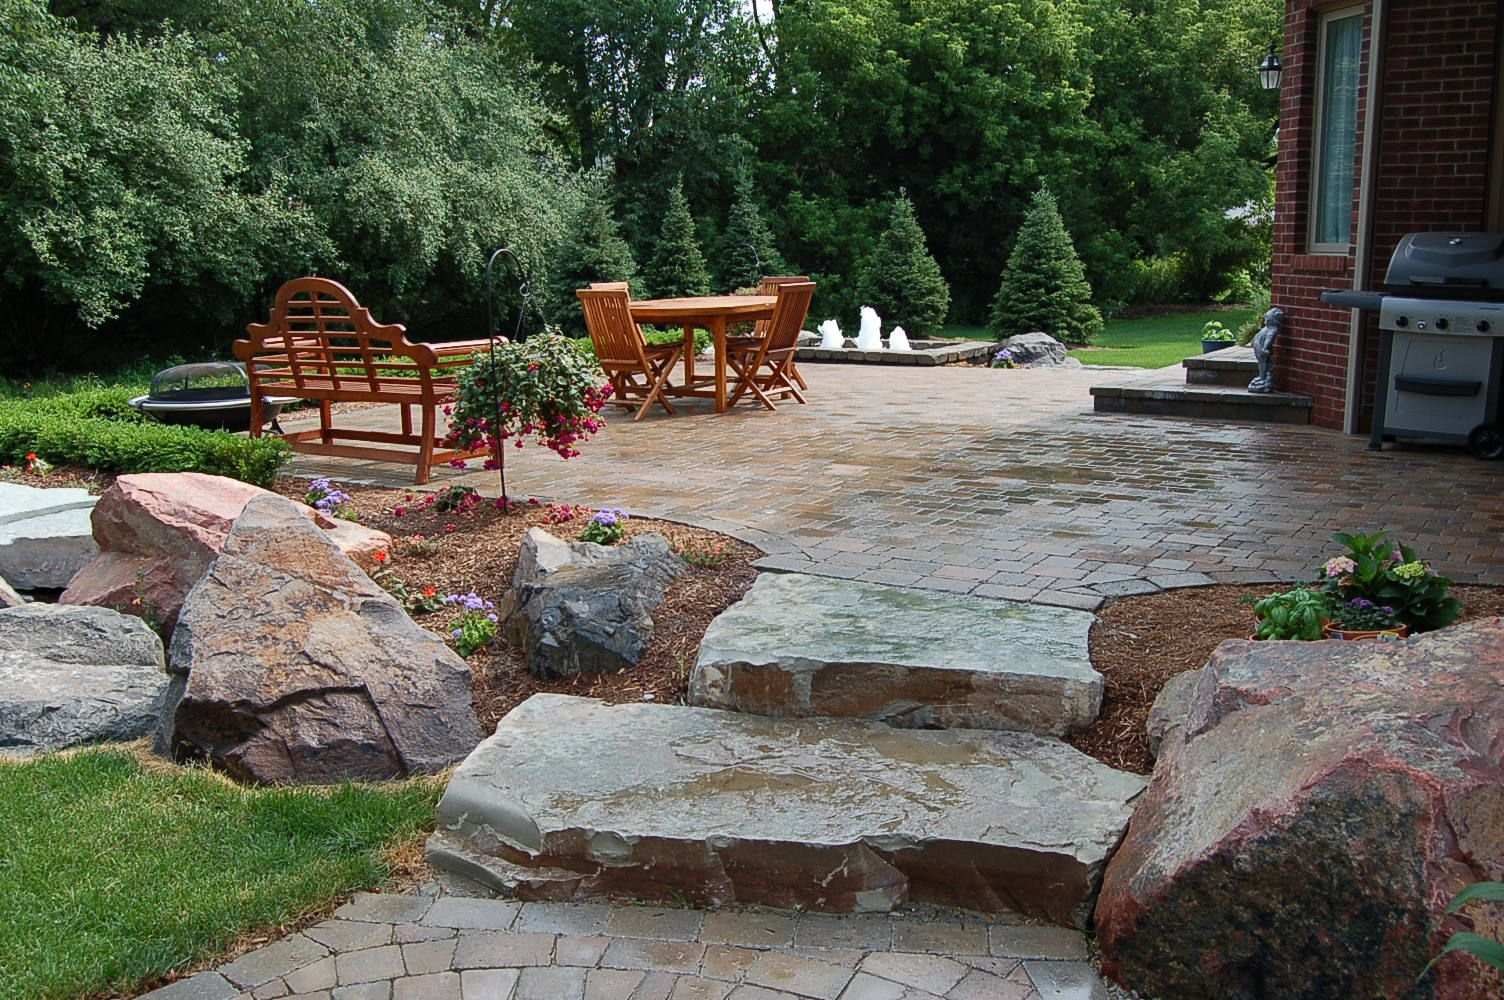 Natural Stone Patio : Brick paver patio natural stone steps water fountain